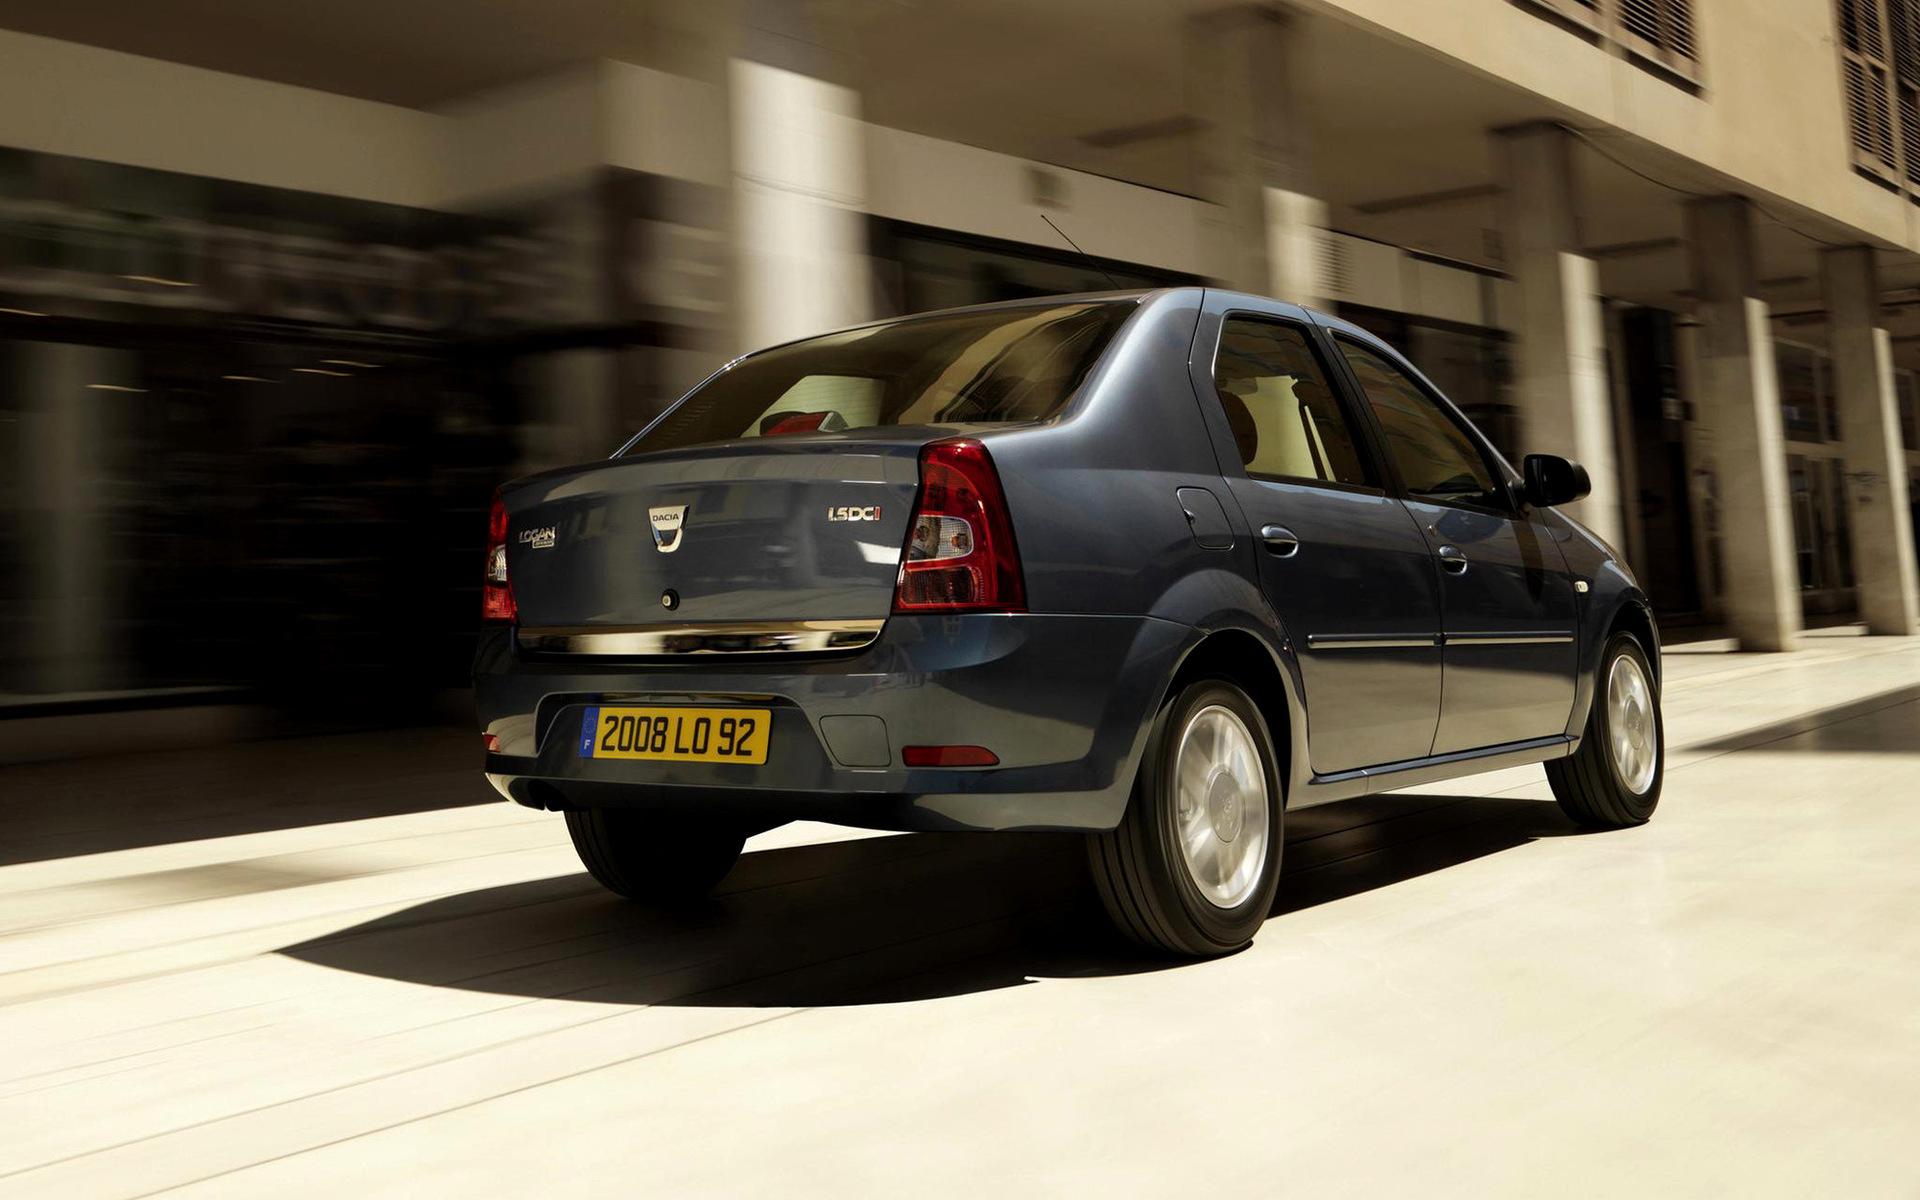 2008 Dacia Logan Wallpapers And Hd Images Car Pixel